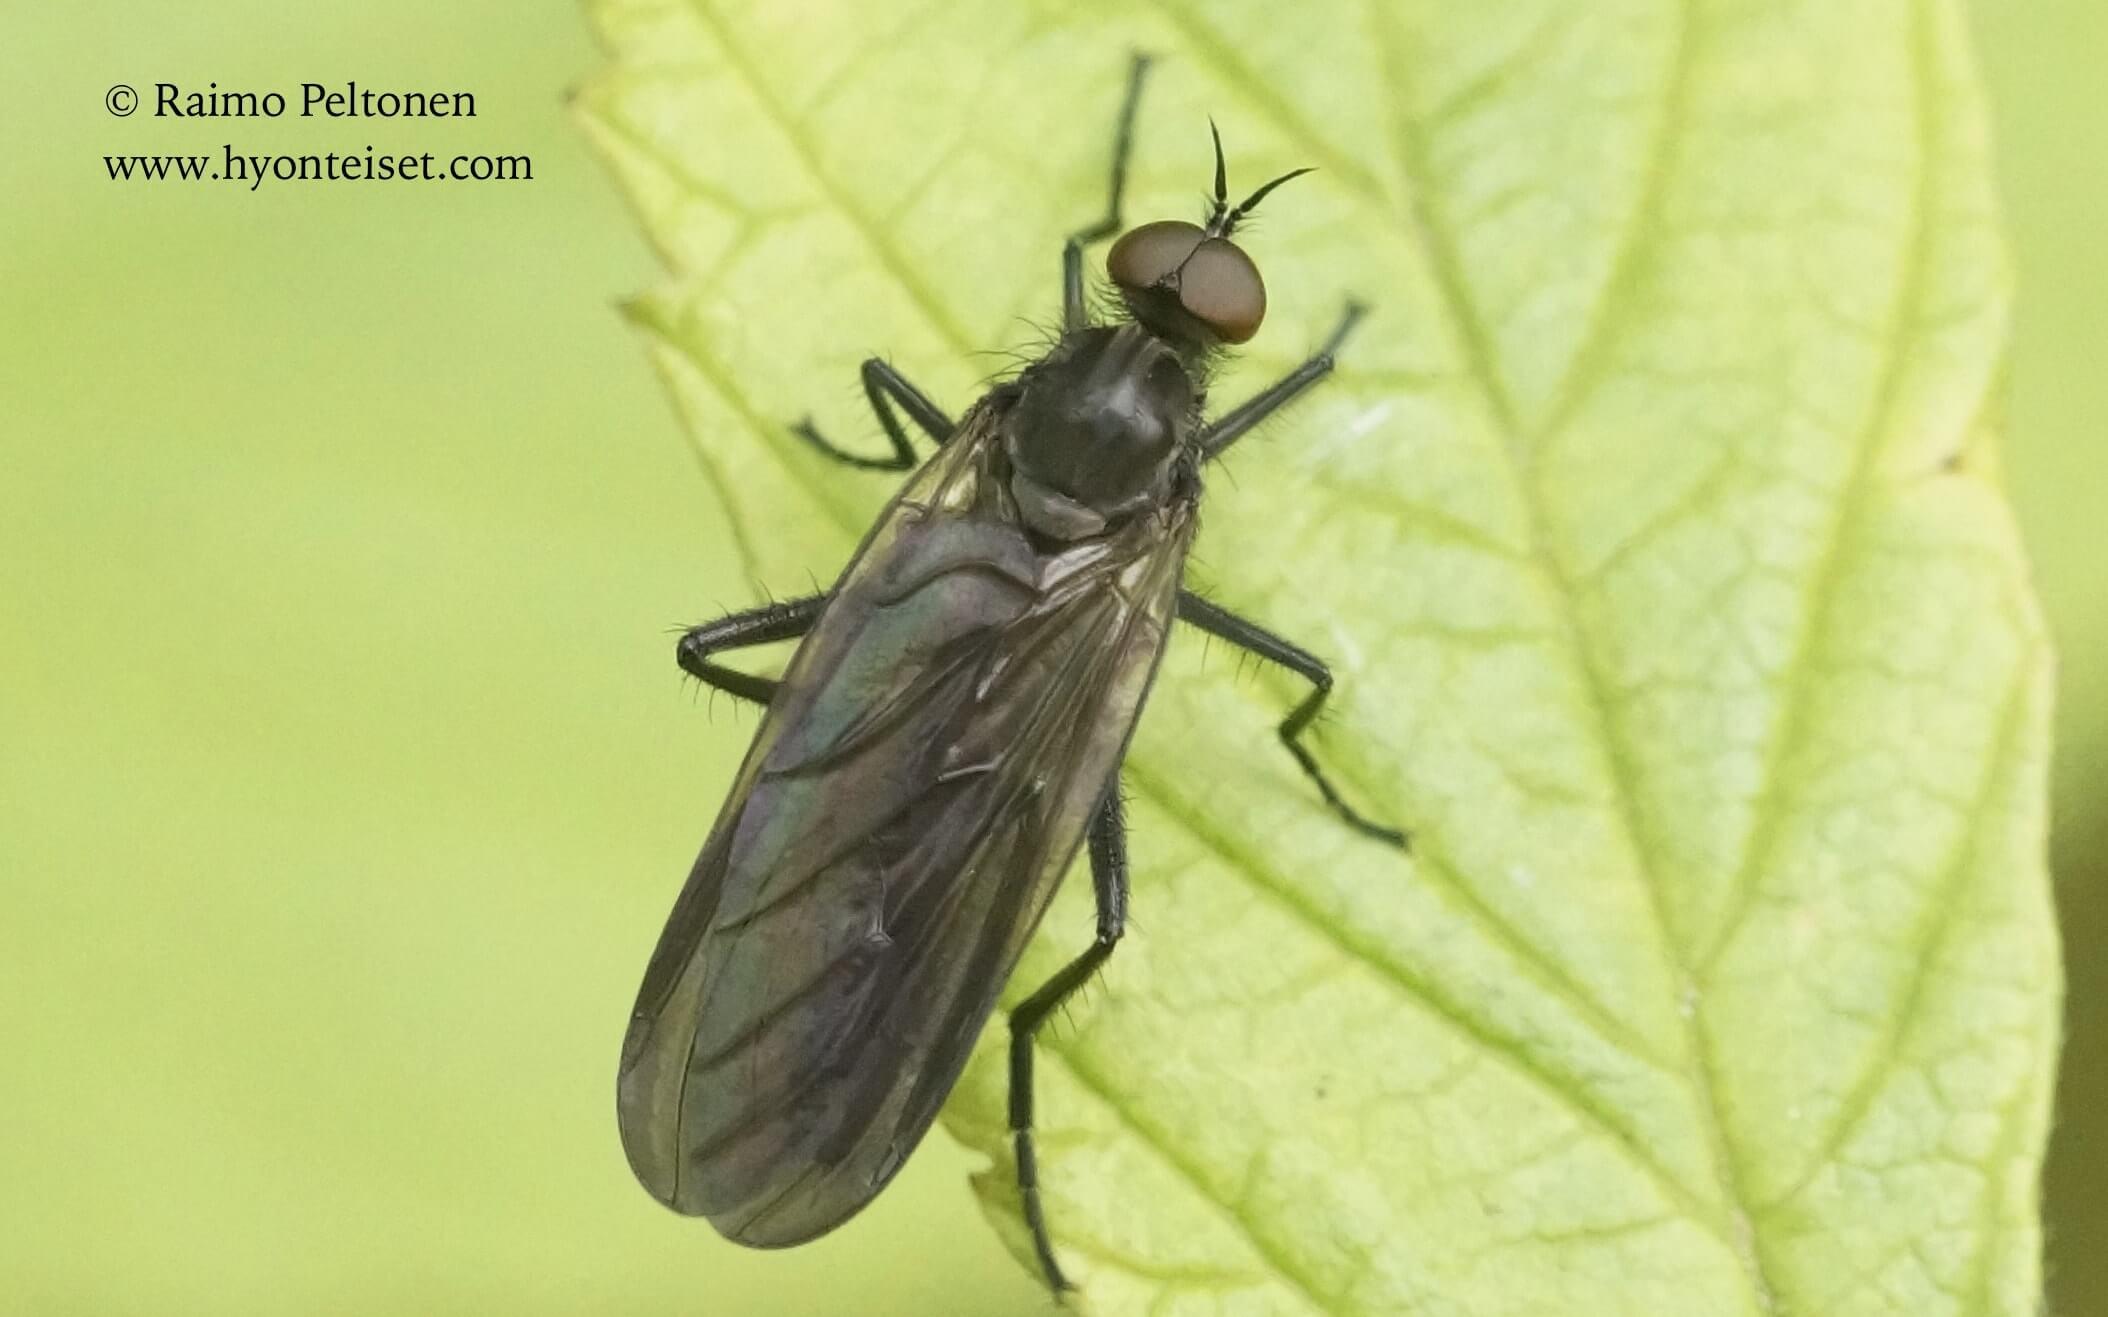 Rhamphomyia spinipes (det. Paul Beuk), 2.9.2017 Jyväskylä